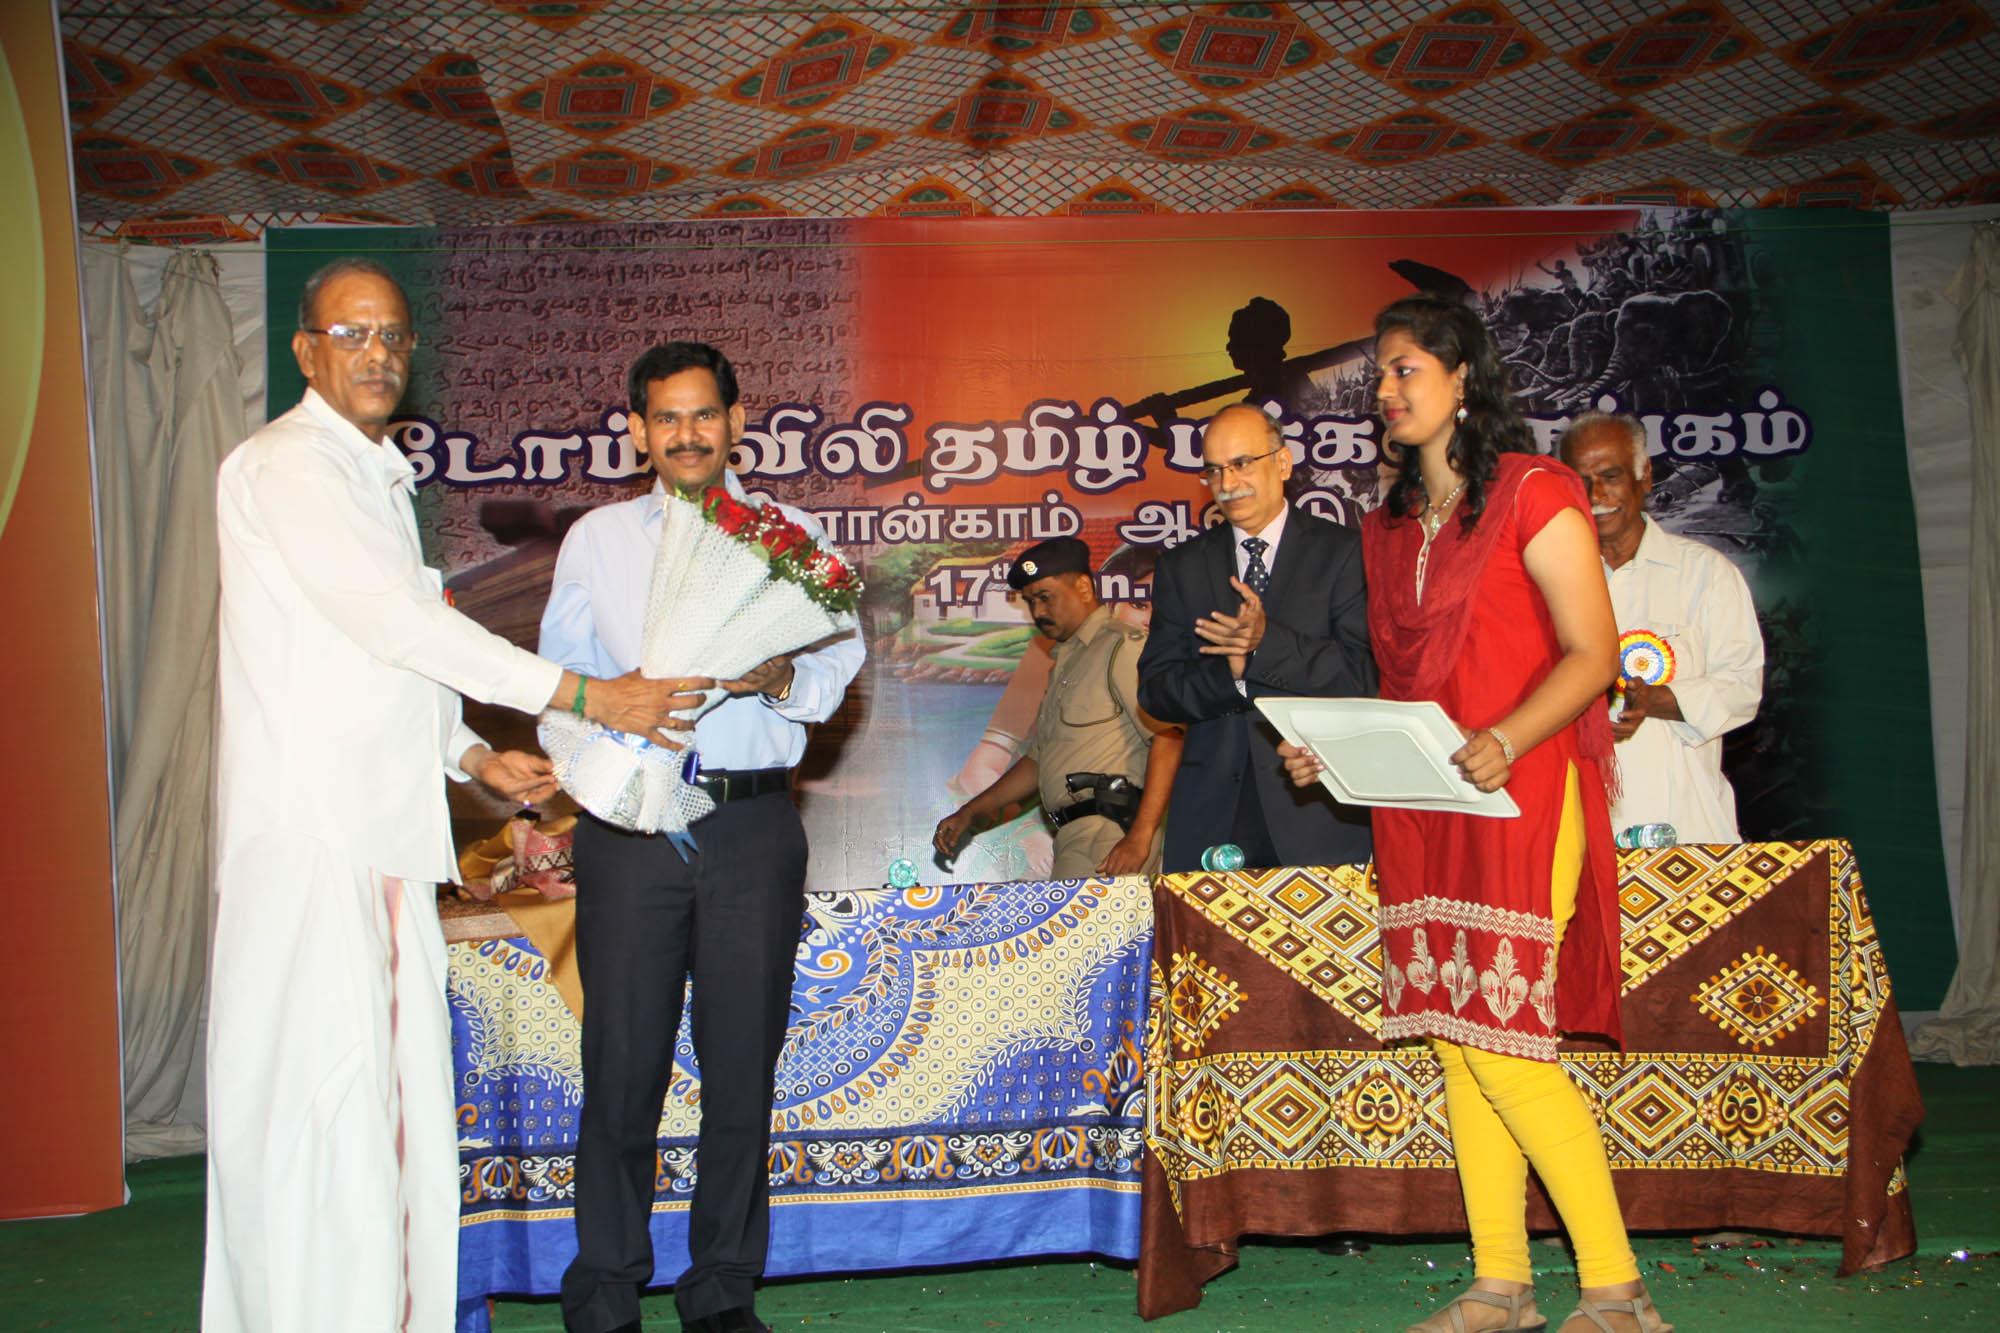 Tamil Sangam, Dombivli Tamil Makkal Sangam